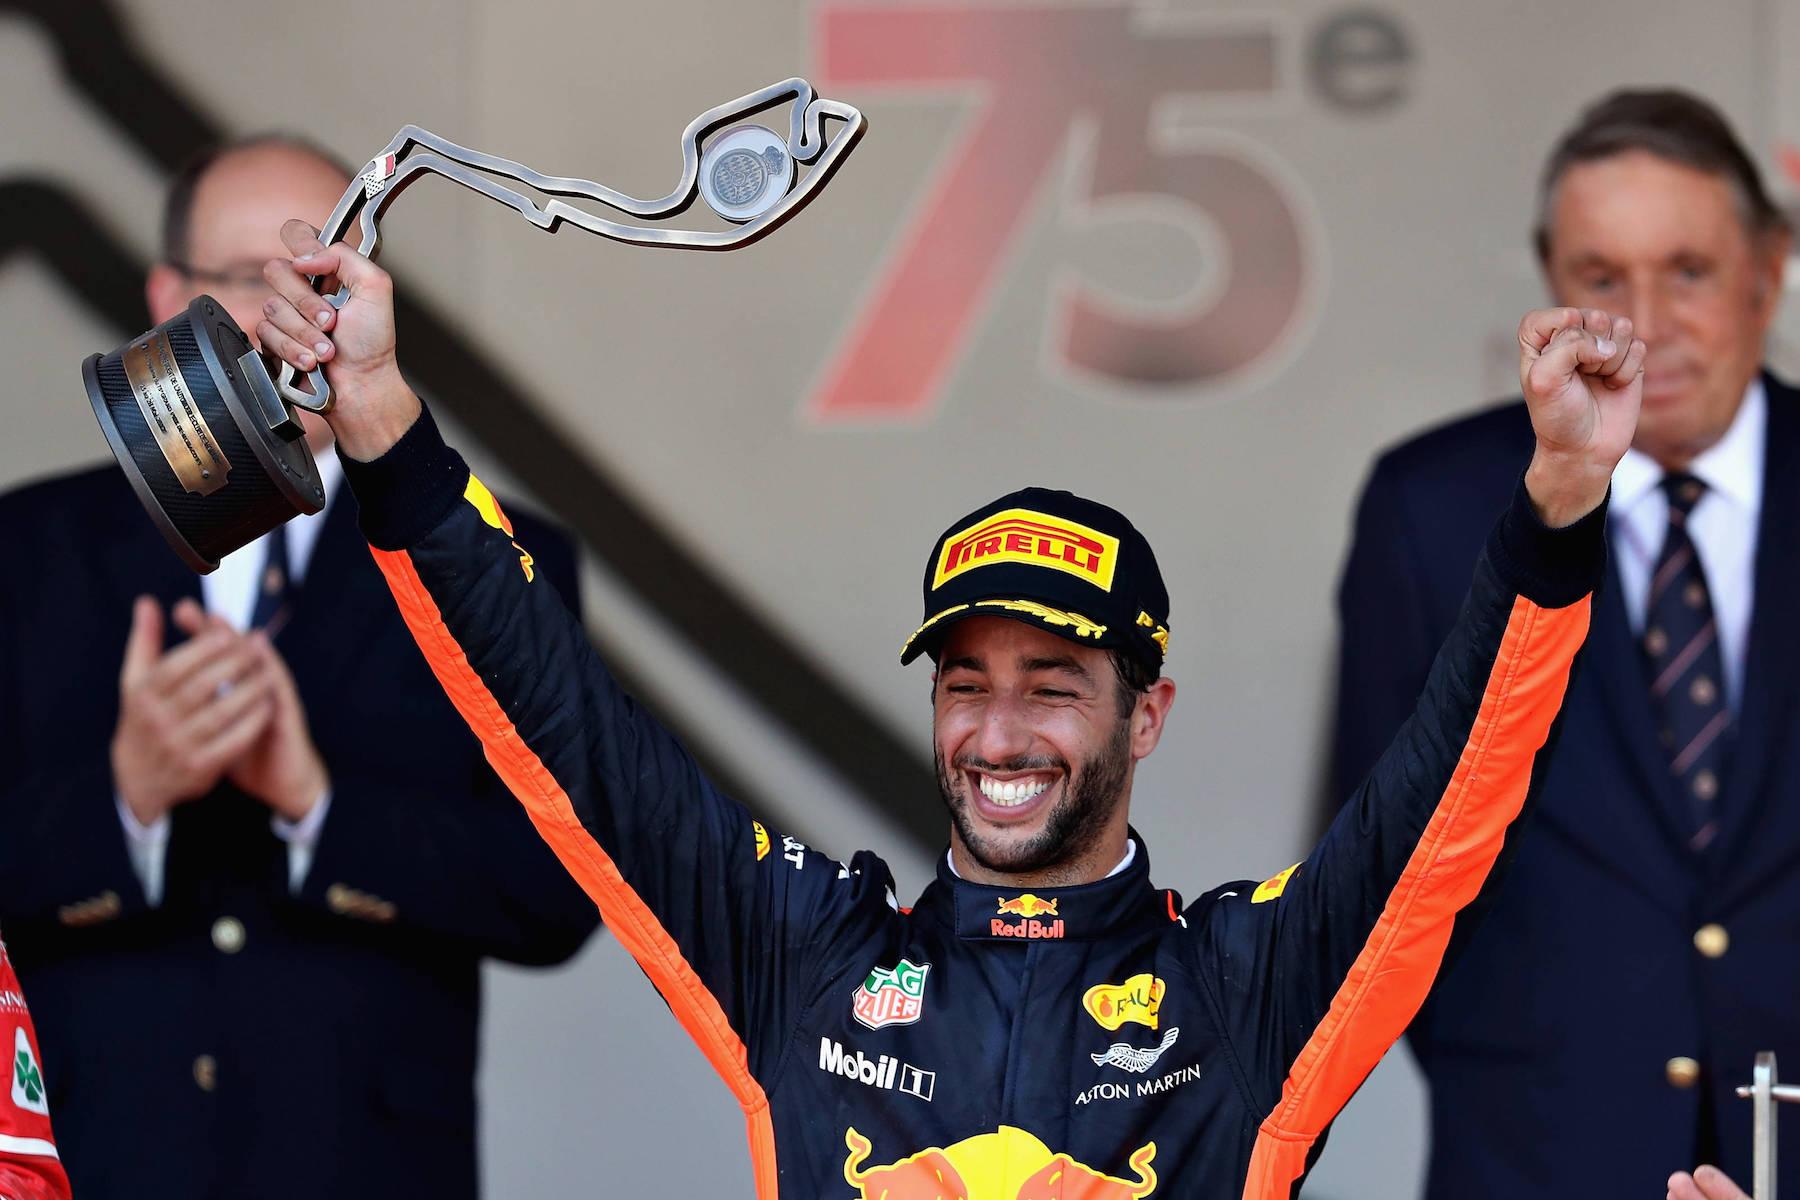 U 2017 Daniel Ricciardo | Red Bull RB13 | 2017 Monaco GP P3 1 copy.jpg